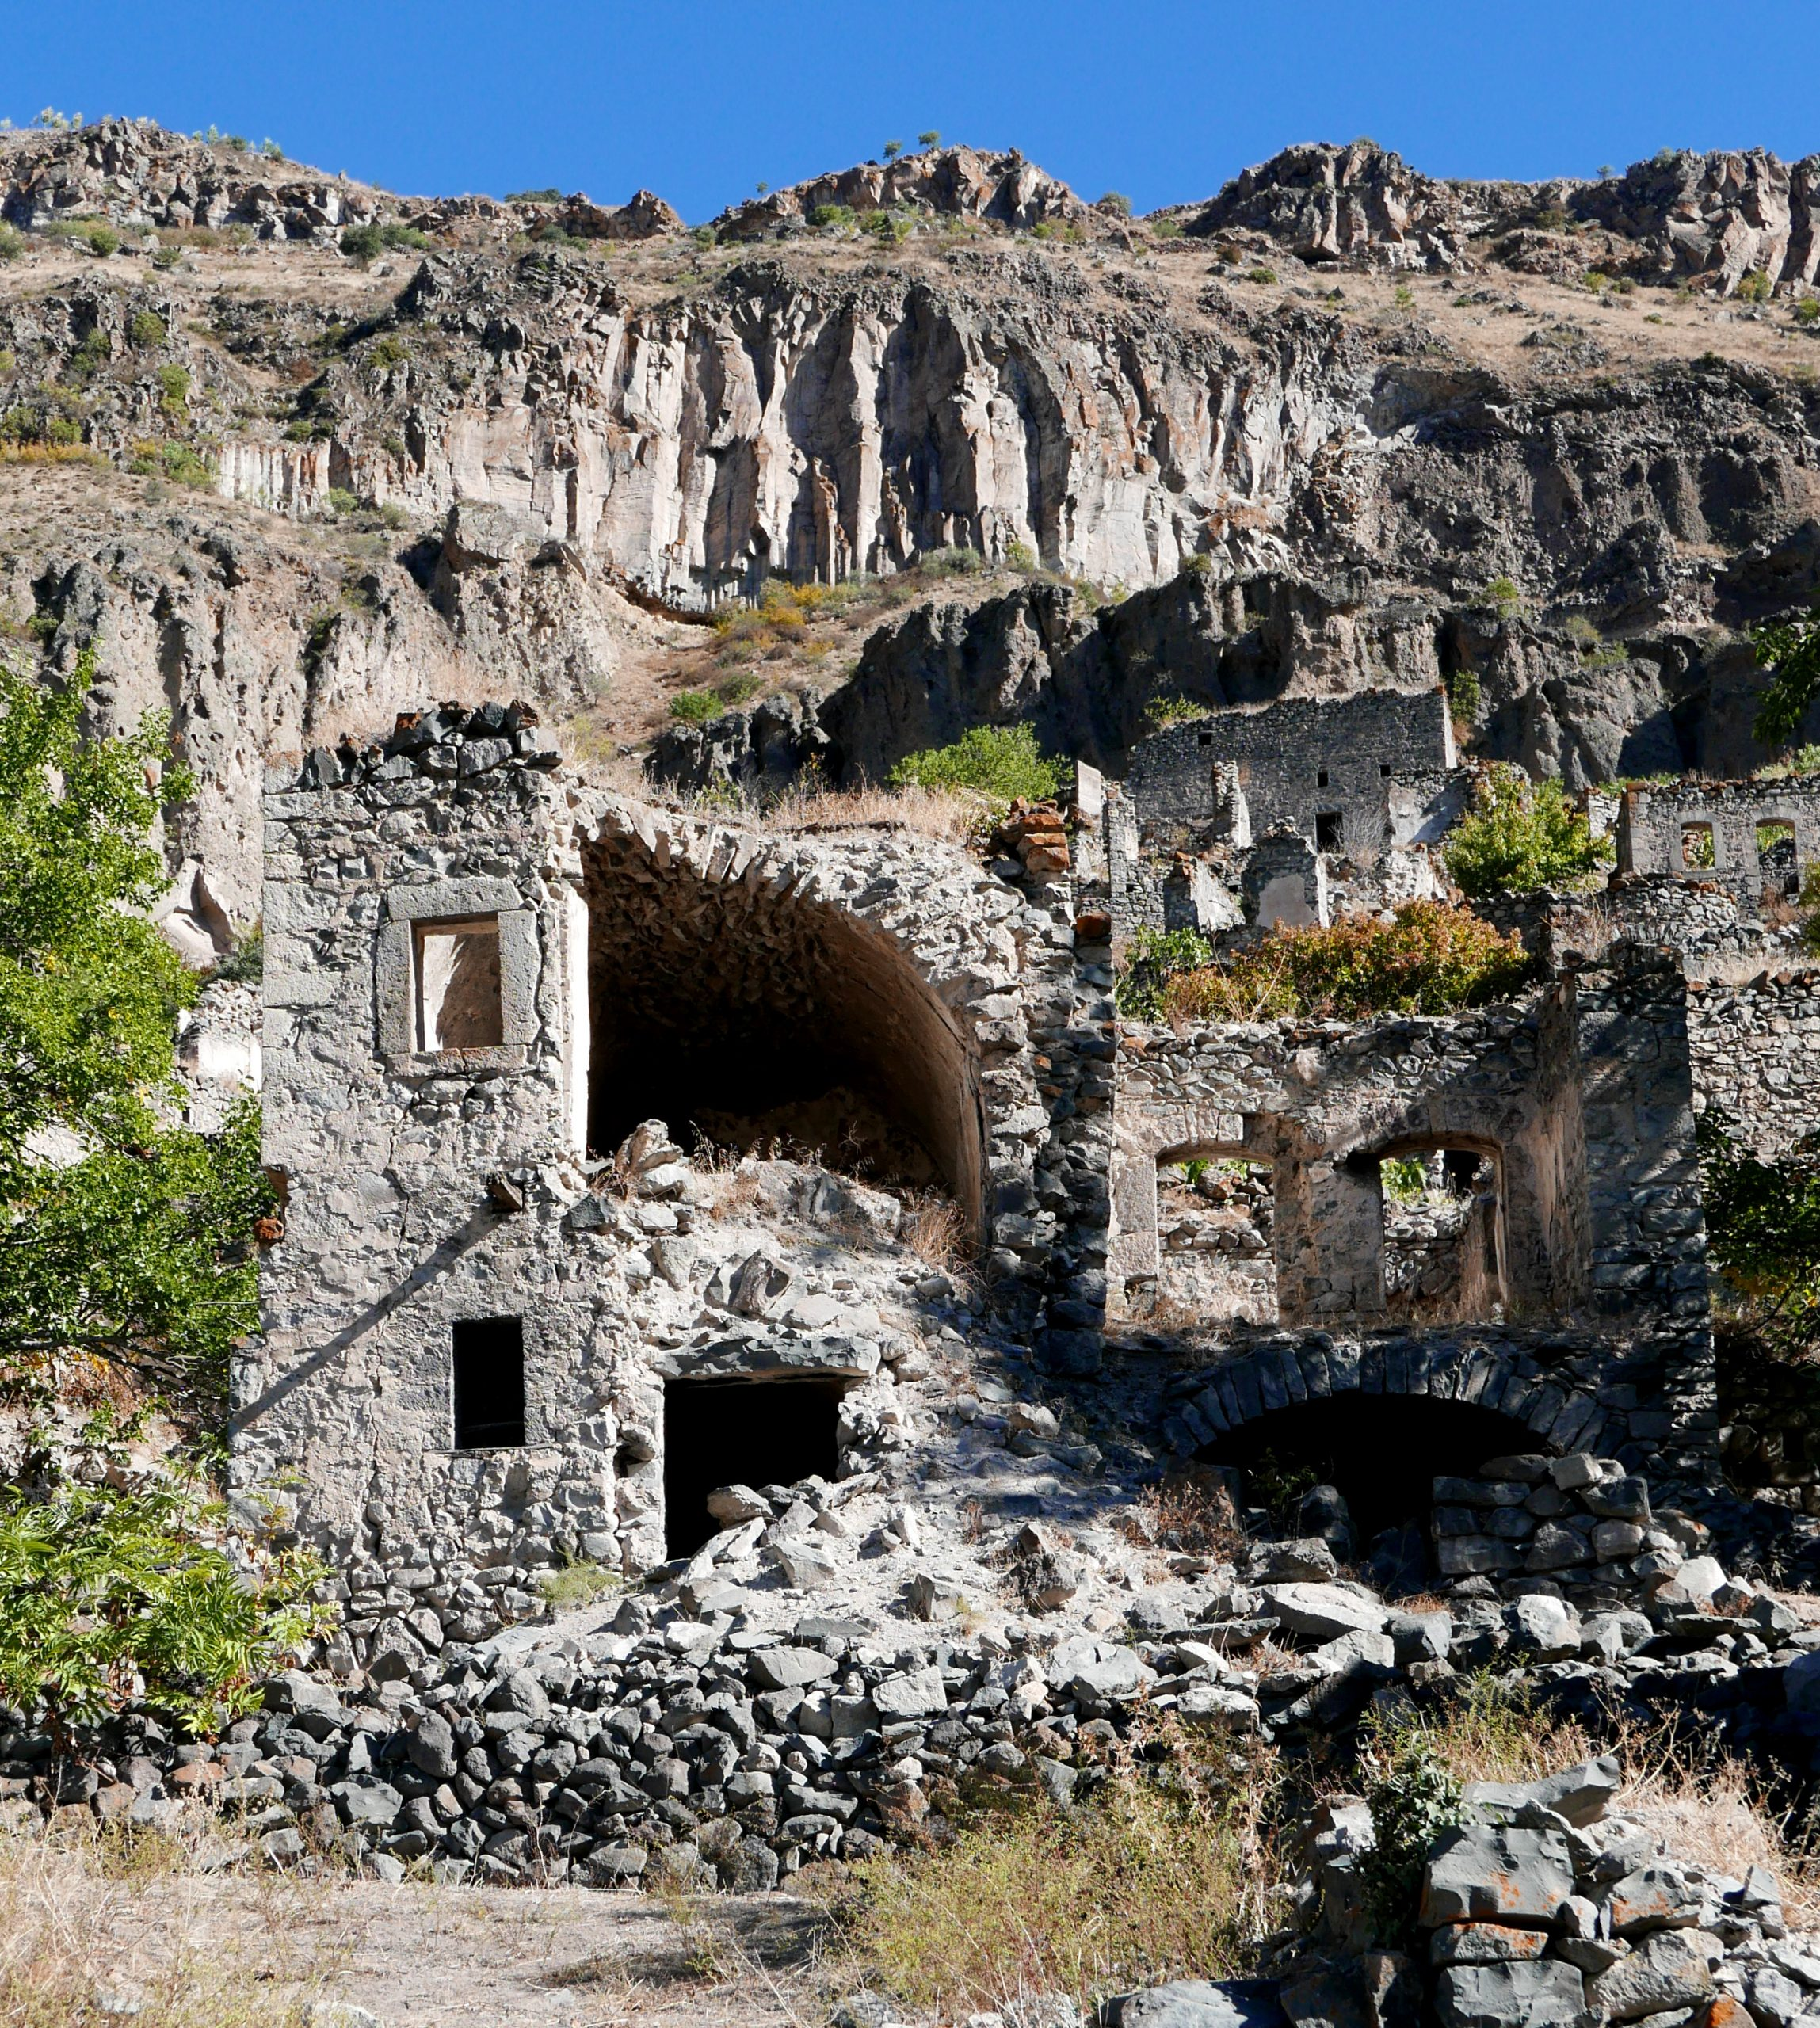 armenien reisen mit Kind bogdanova